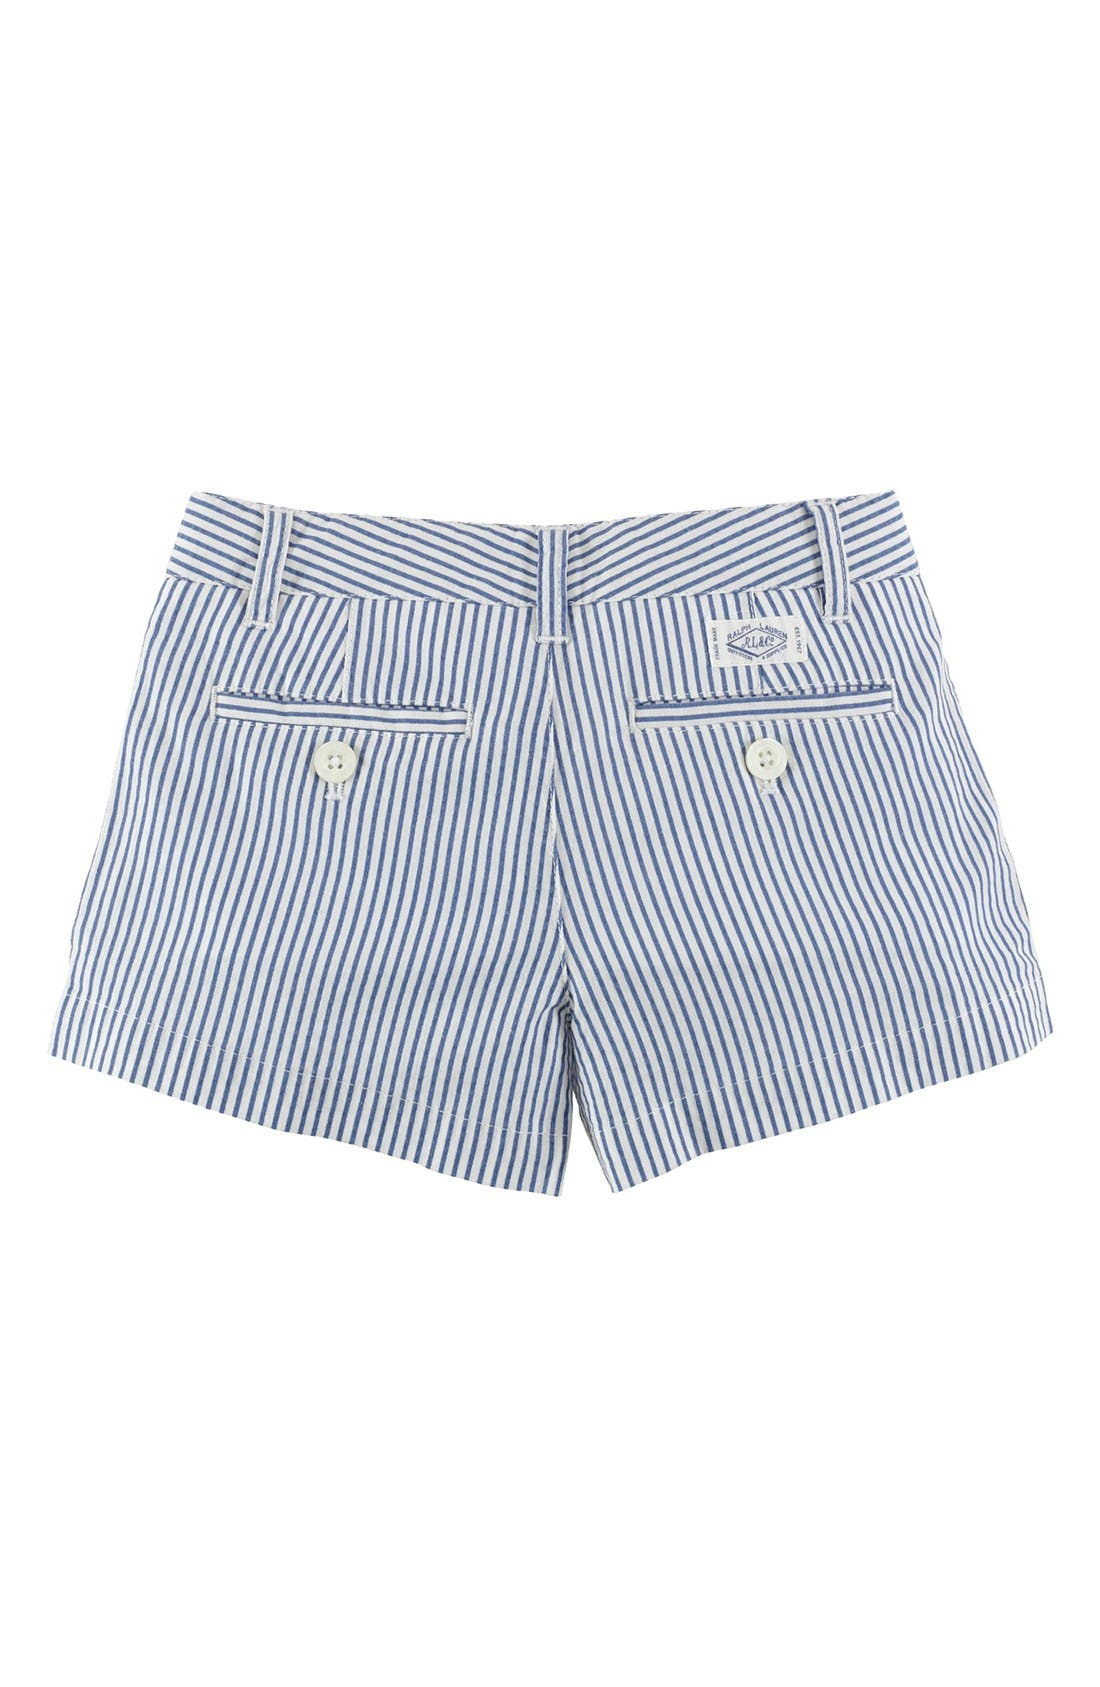 Alternate Image 2  - Ralph Lauren Seersucker Shorts (Toddler Girls)